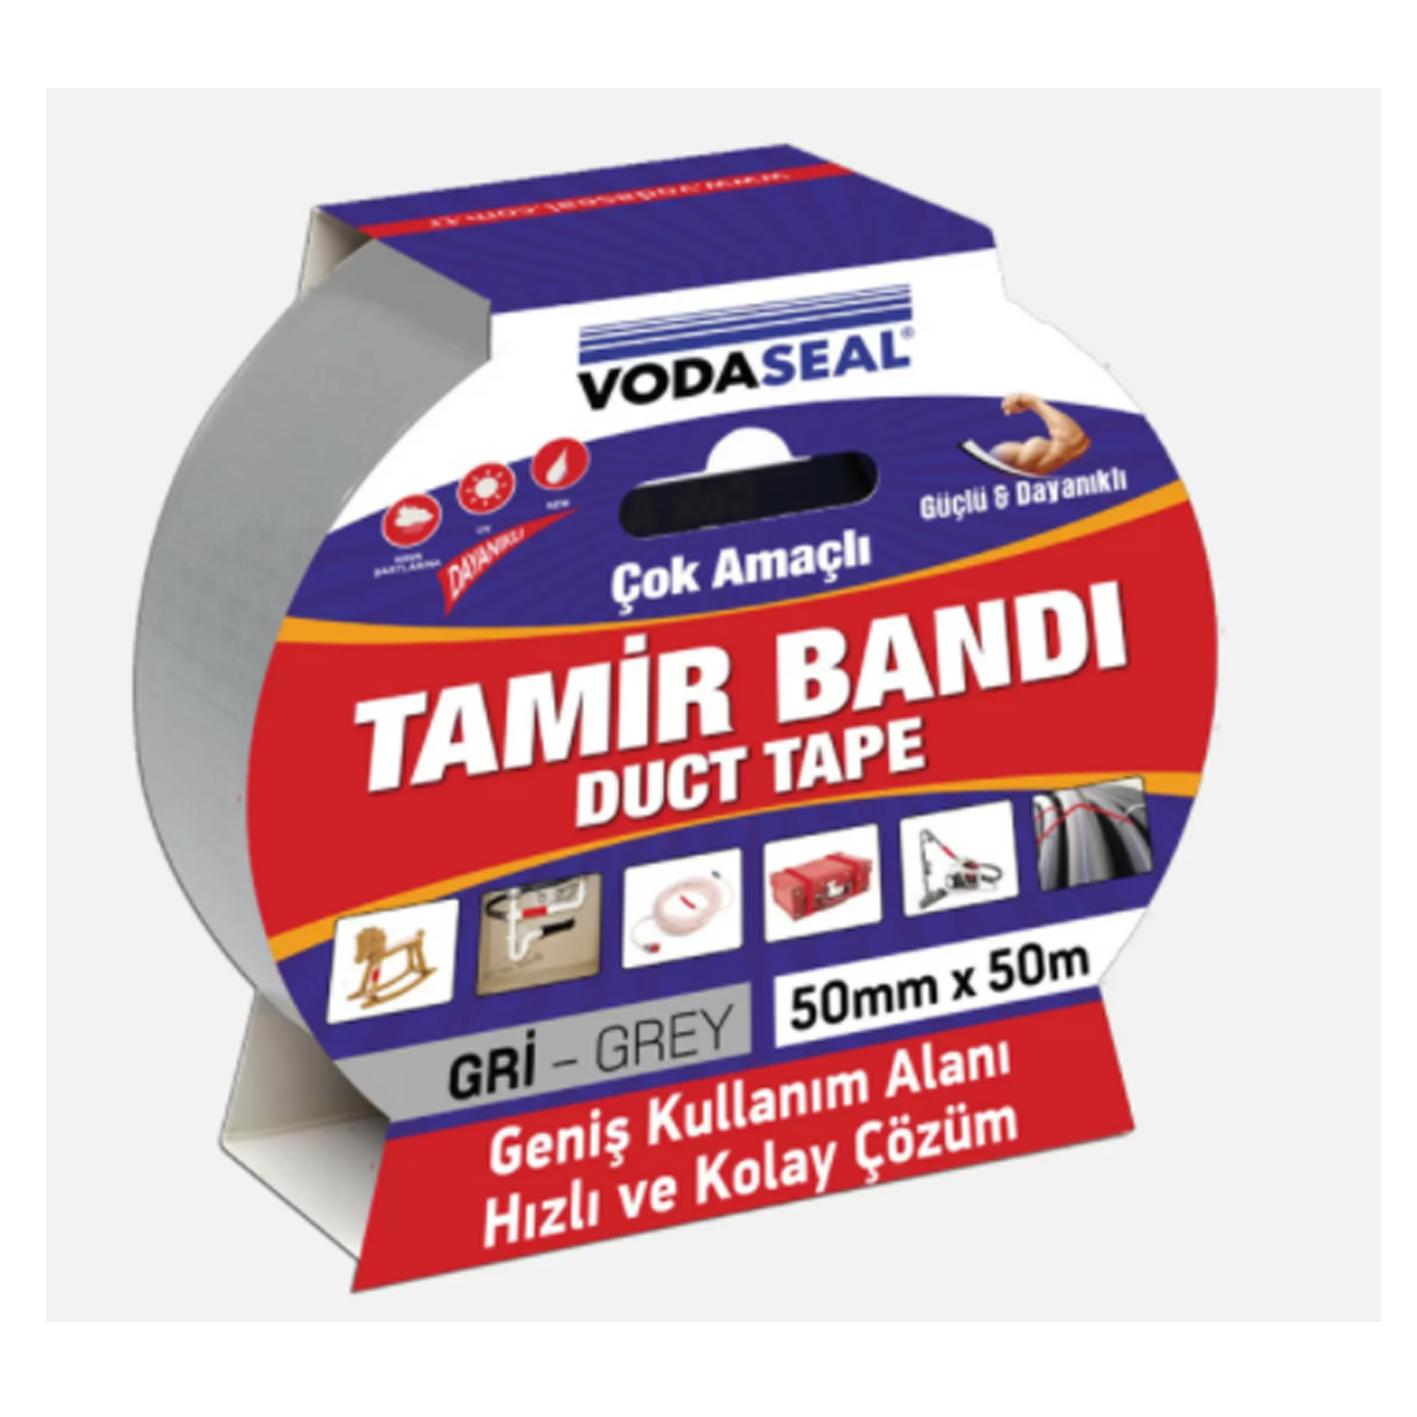 Vodaseal Duct Tape - Tamir Bandı 50Mm X 50M Siyah